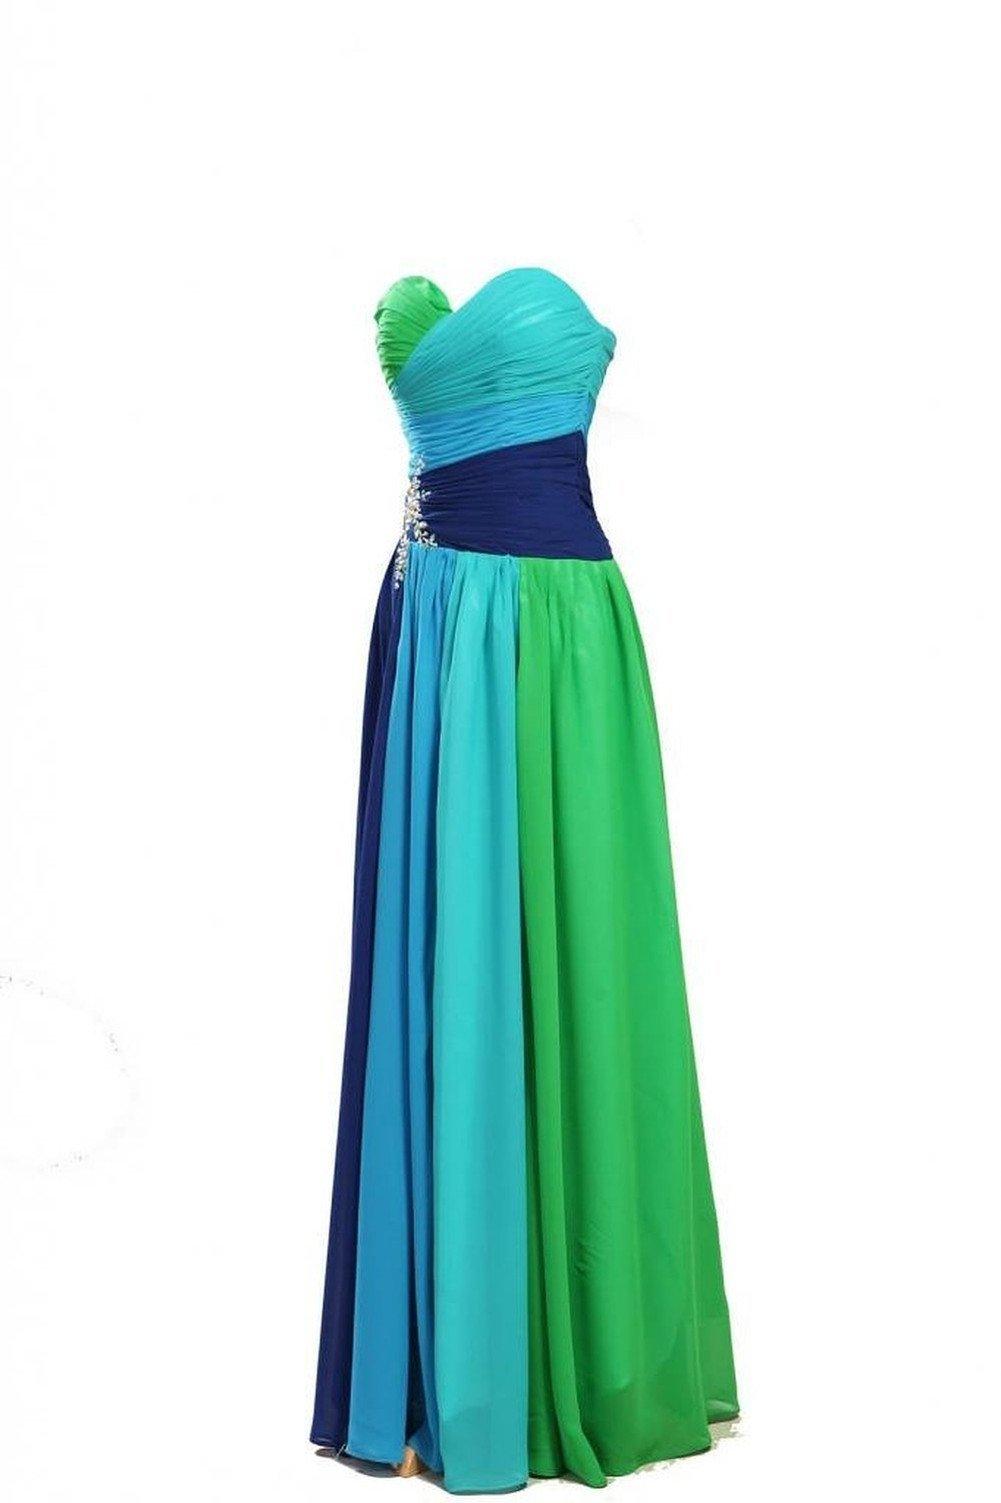 Dormencir Women's Rhinestone Colorful Long Bridesmaid Prom Evening Dresses (12) by Dormencir (Image #5)